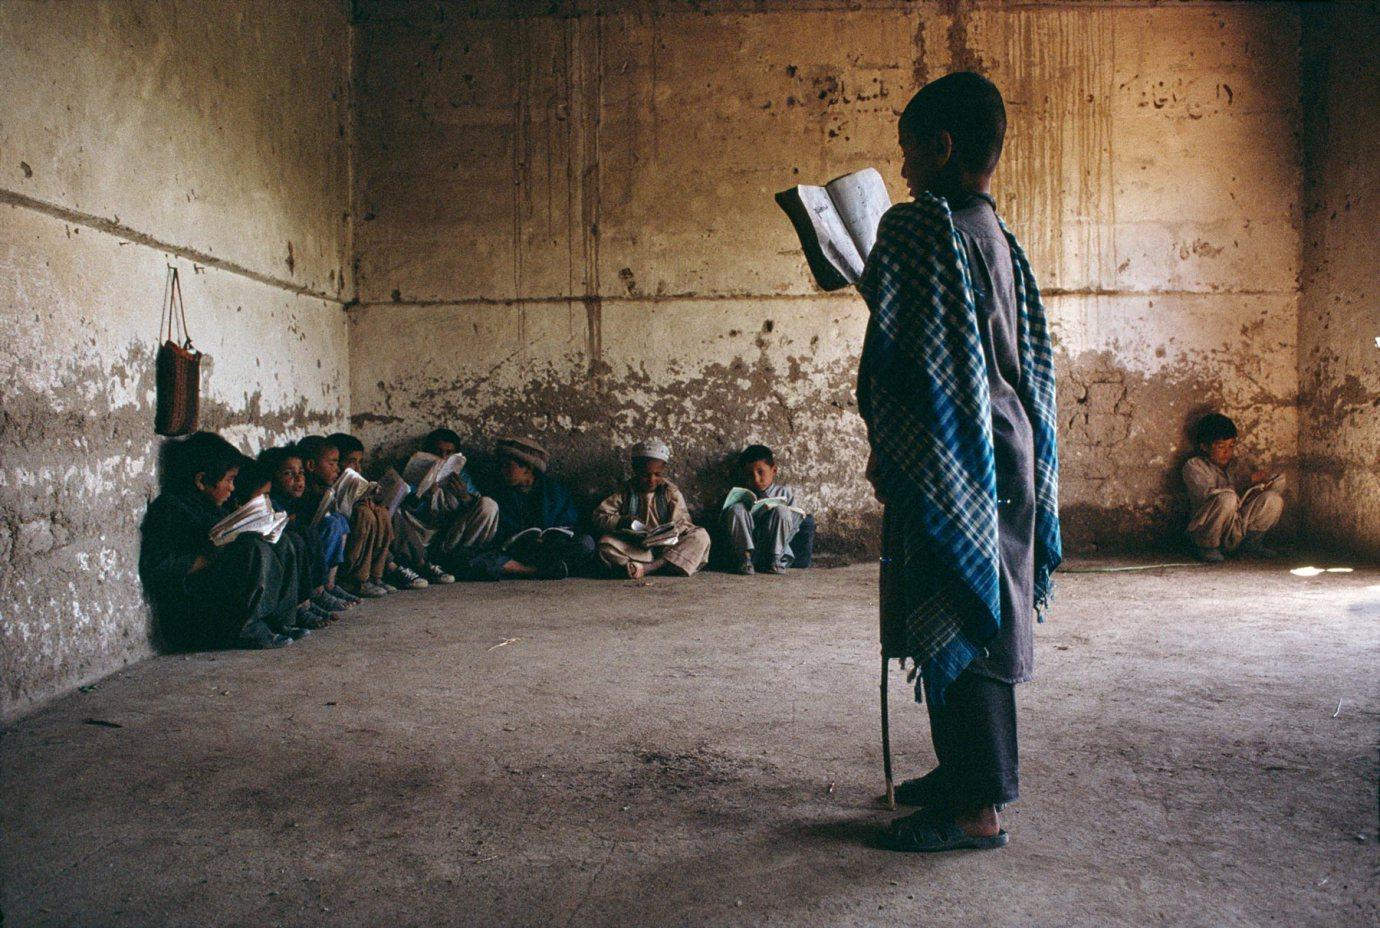 AFGHN-13093; Afghanistan, 06/1992